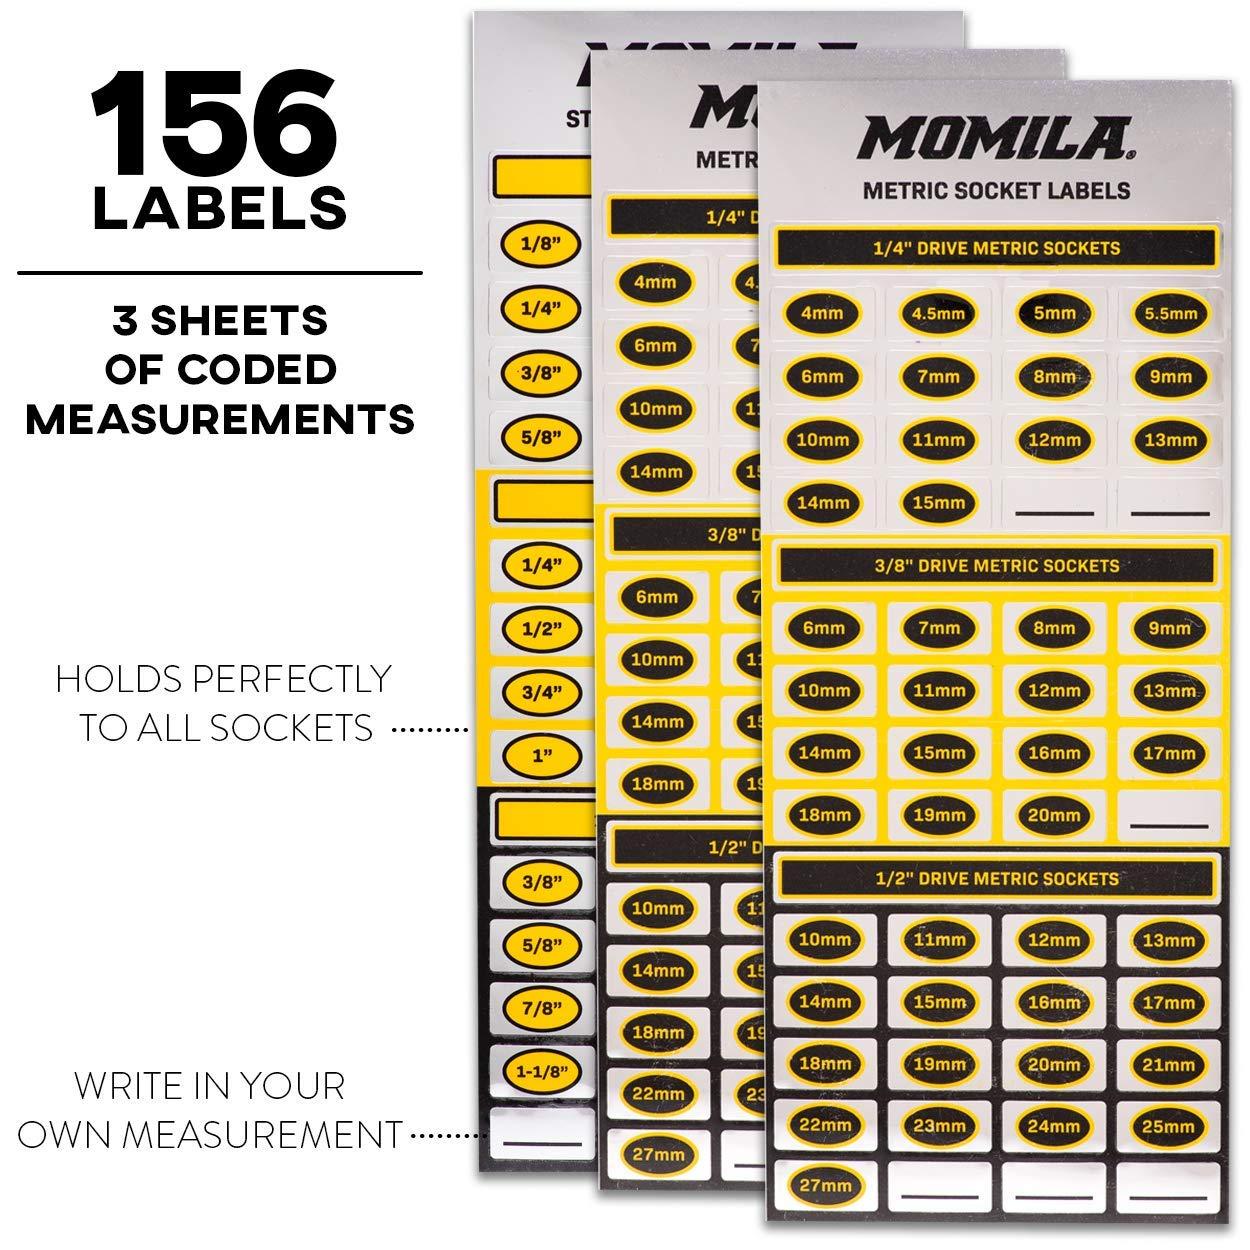 Socket Organizer Trays - 6 Piece Socket Tray Set Black SAE & Yellow Metric | 1/4-Inch, 3/8-Inch & 1/2-Inch Drive Socket Holder | Premium Quality Tool Organizers by Momila (Image #6)